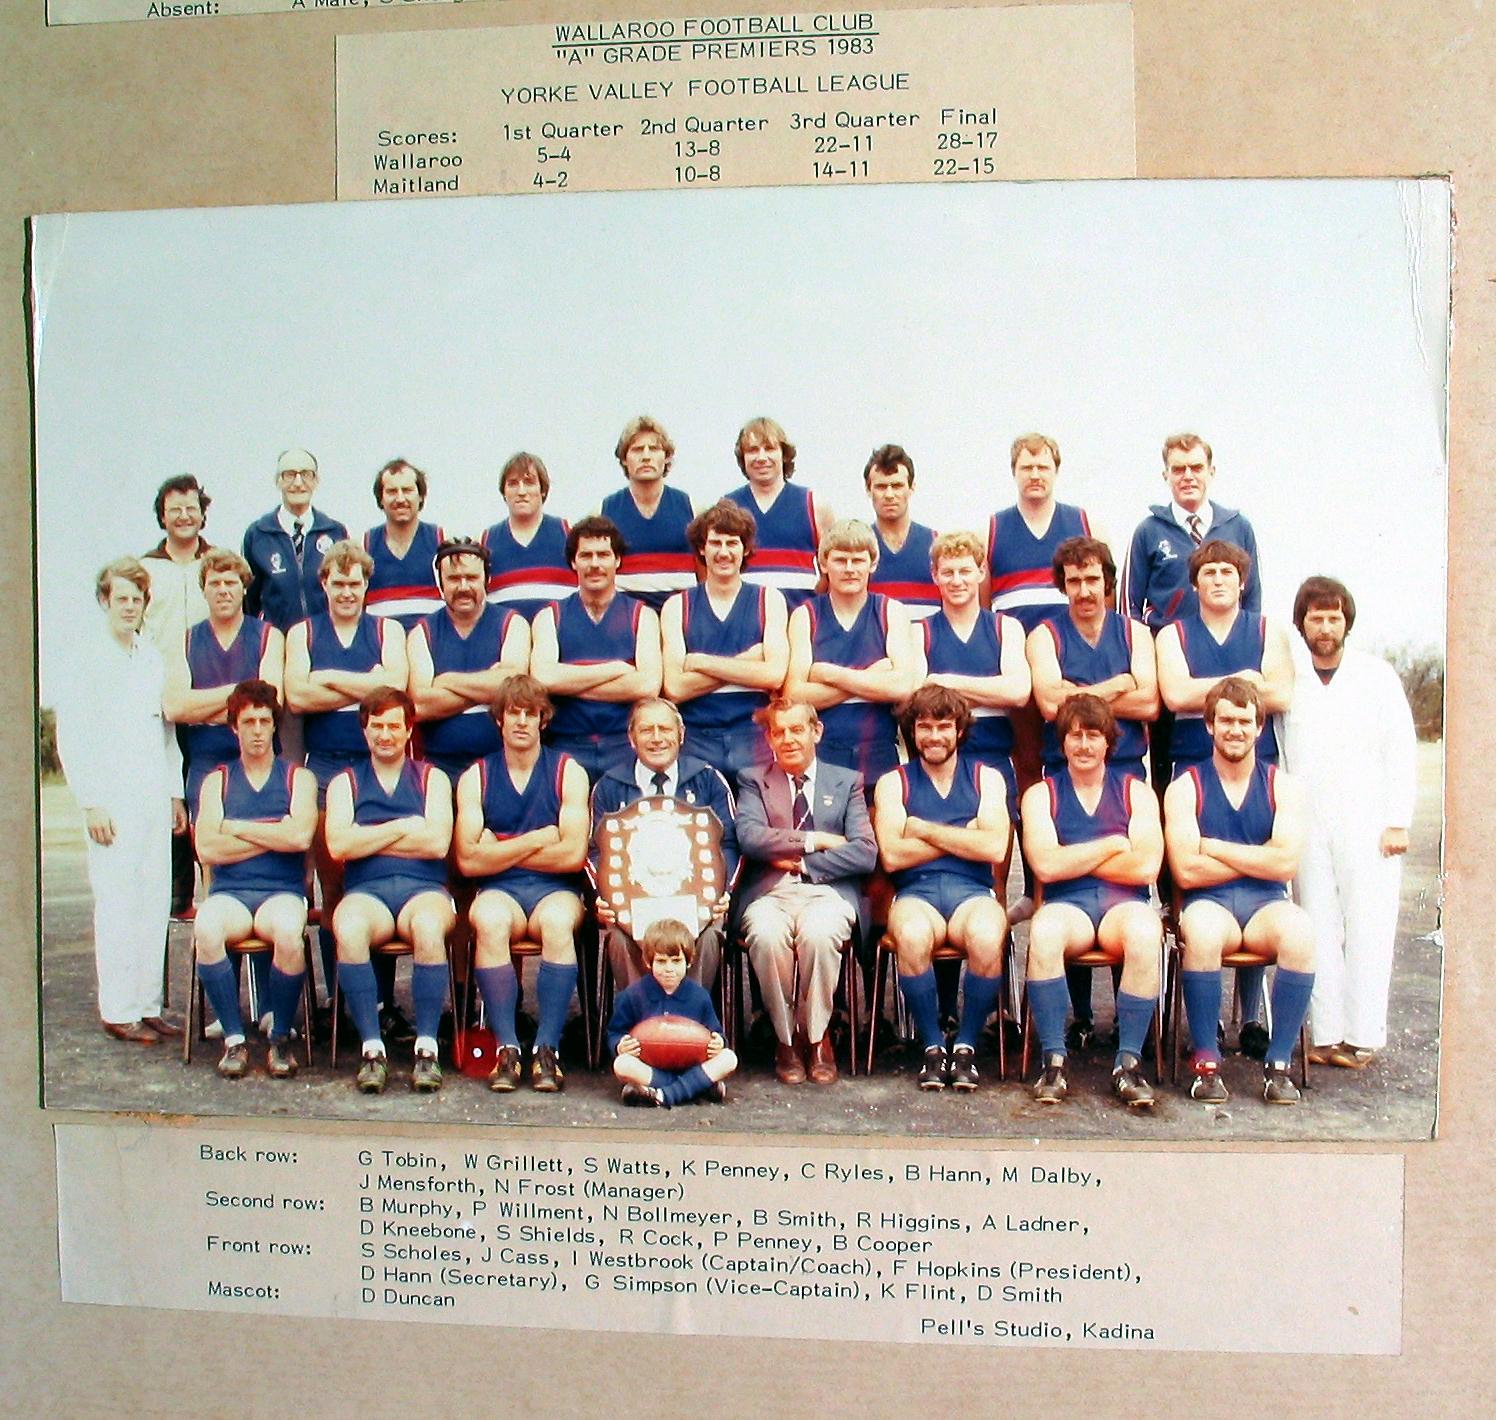 A Grade Premiers 1983